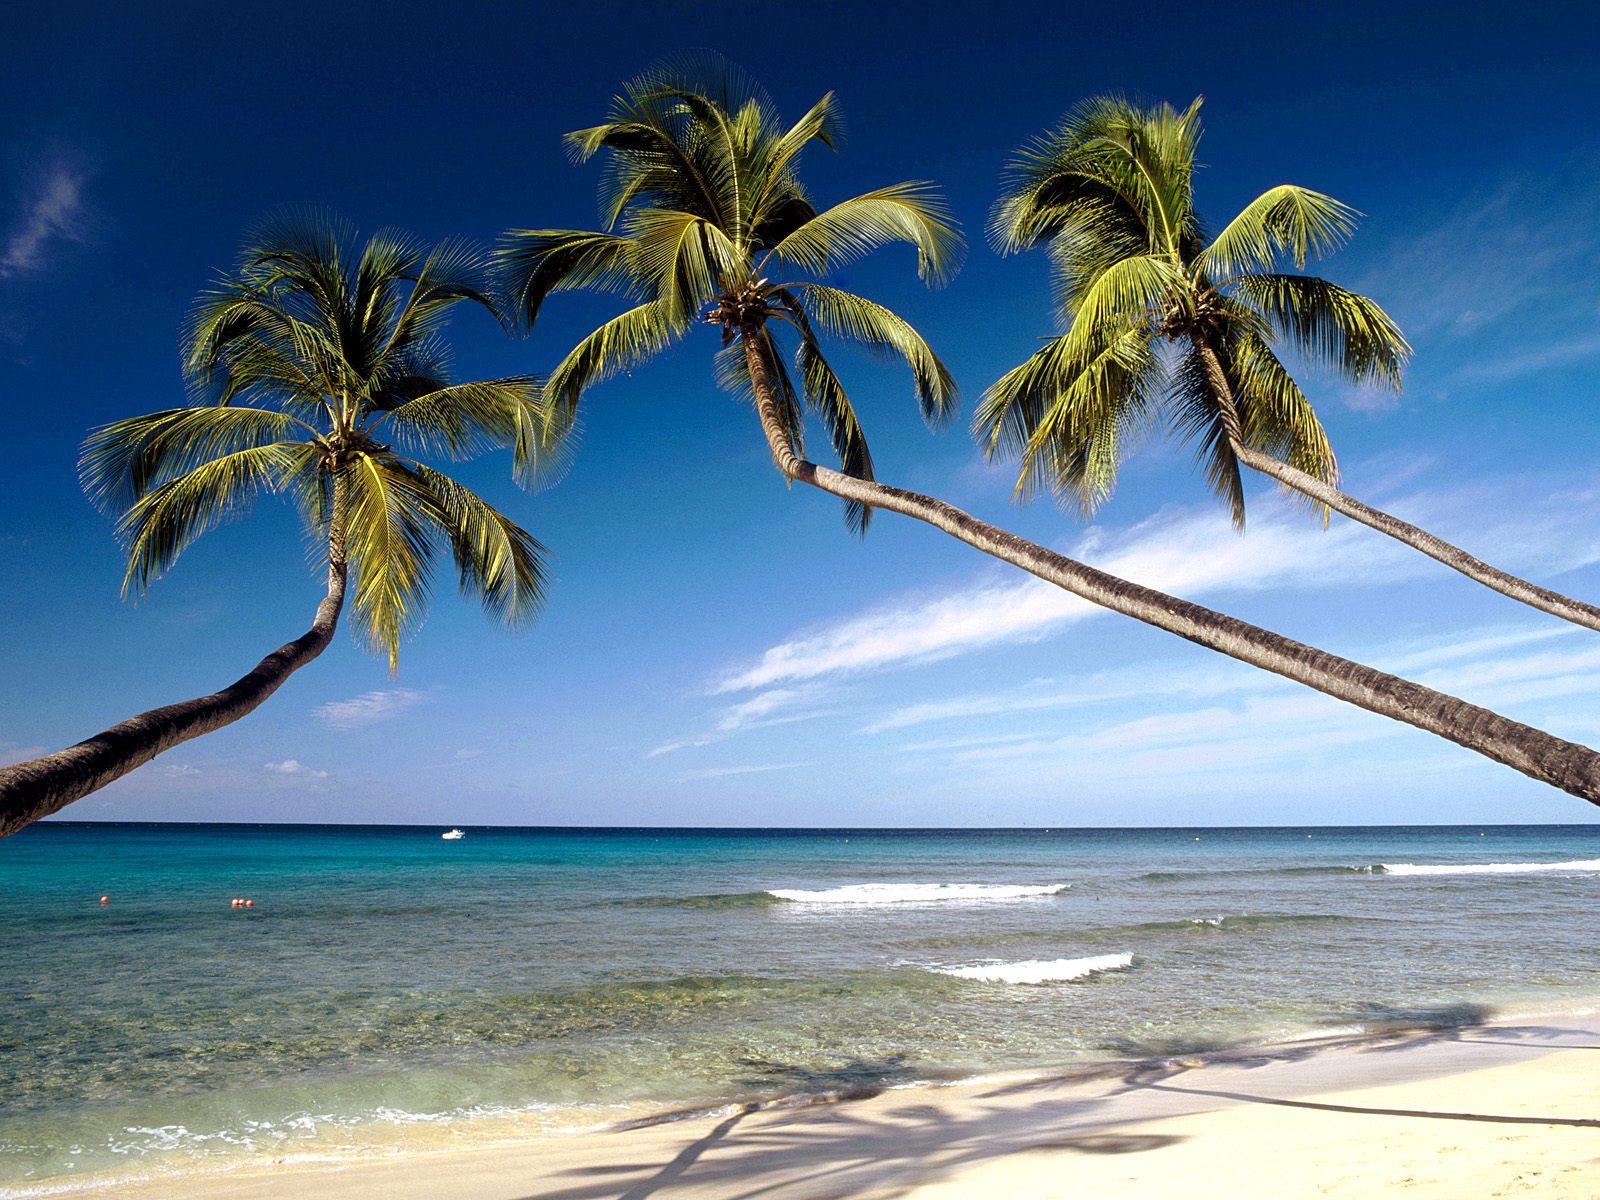 Caribbean beach wallpaper The Images 1600x1200